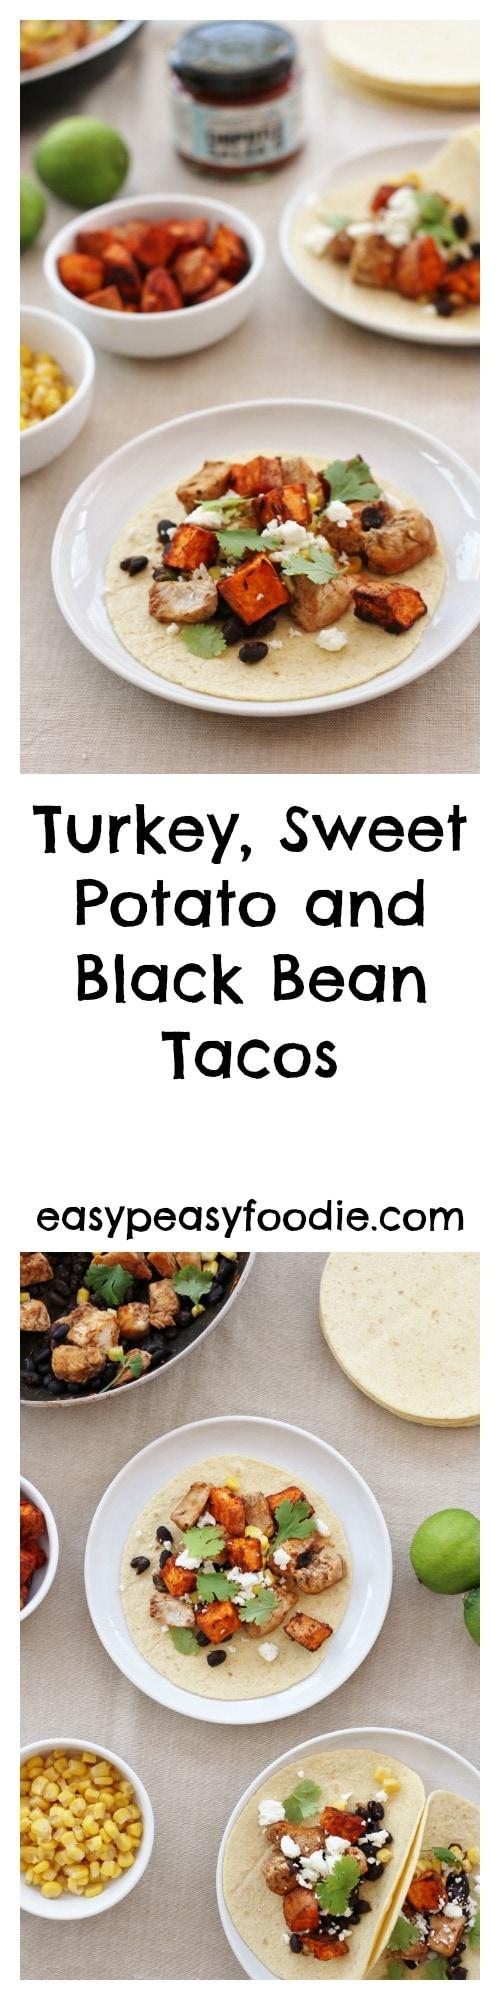 Turkey, Sweet Potato and Black Bean Tacos - pinnable image for Pinterest